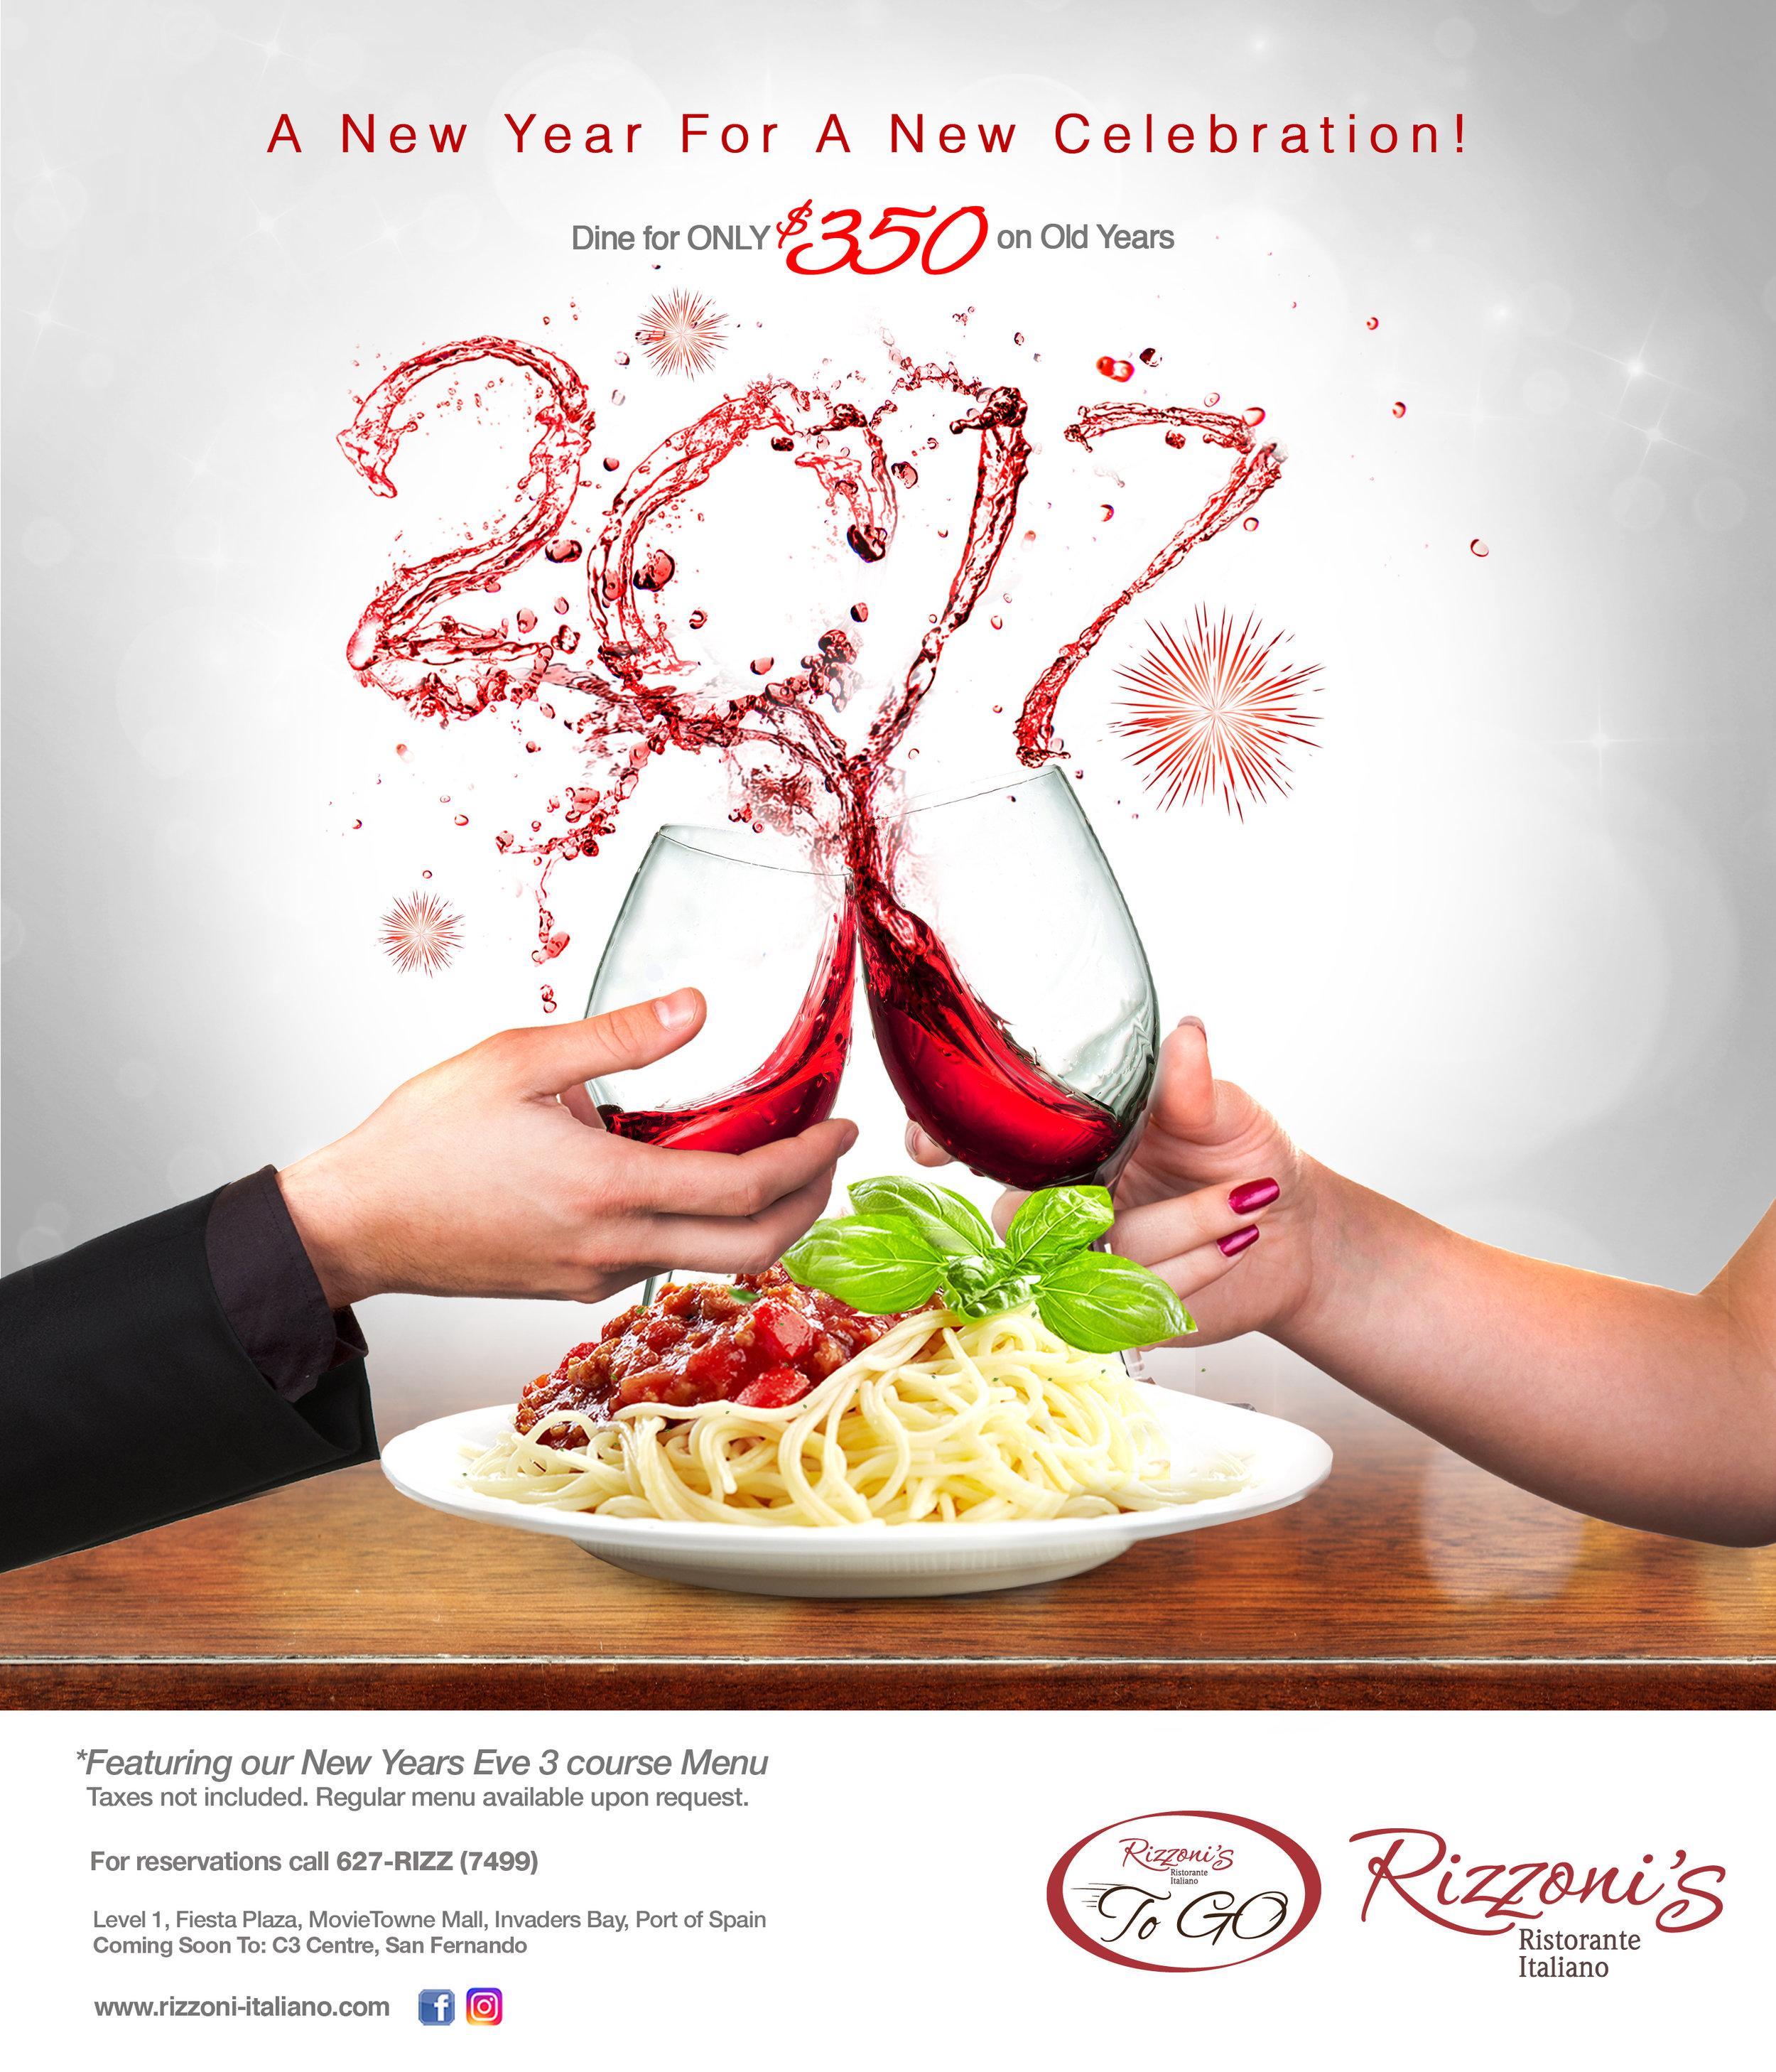 Rizzoni's New Years Day ad 700x600.jpg